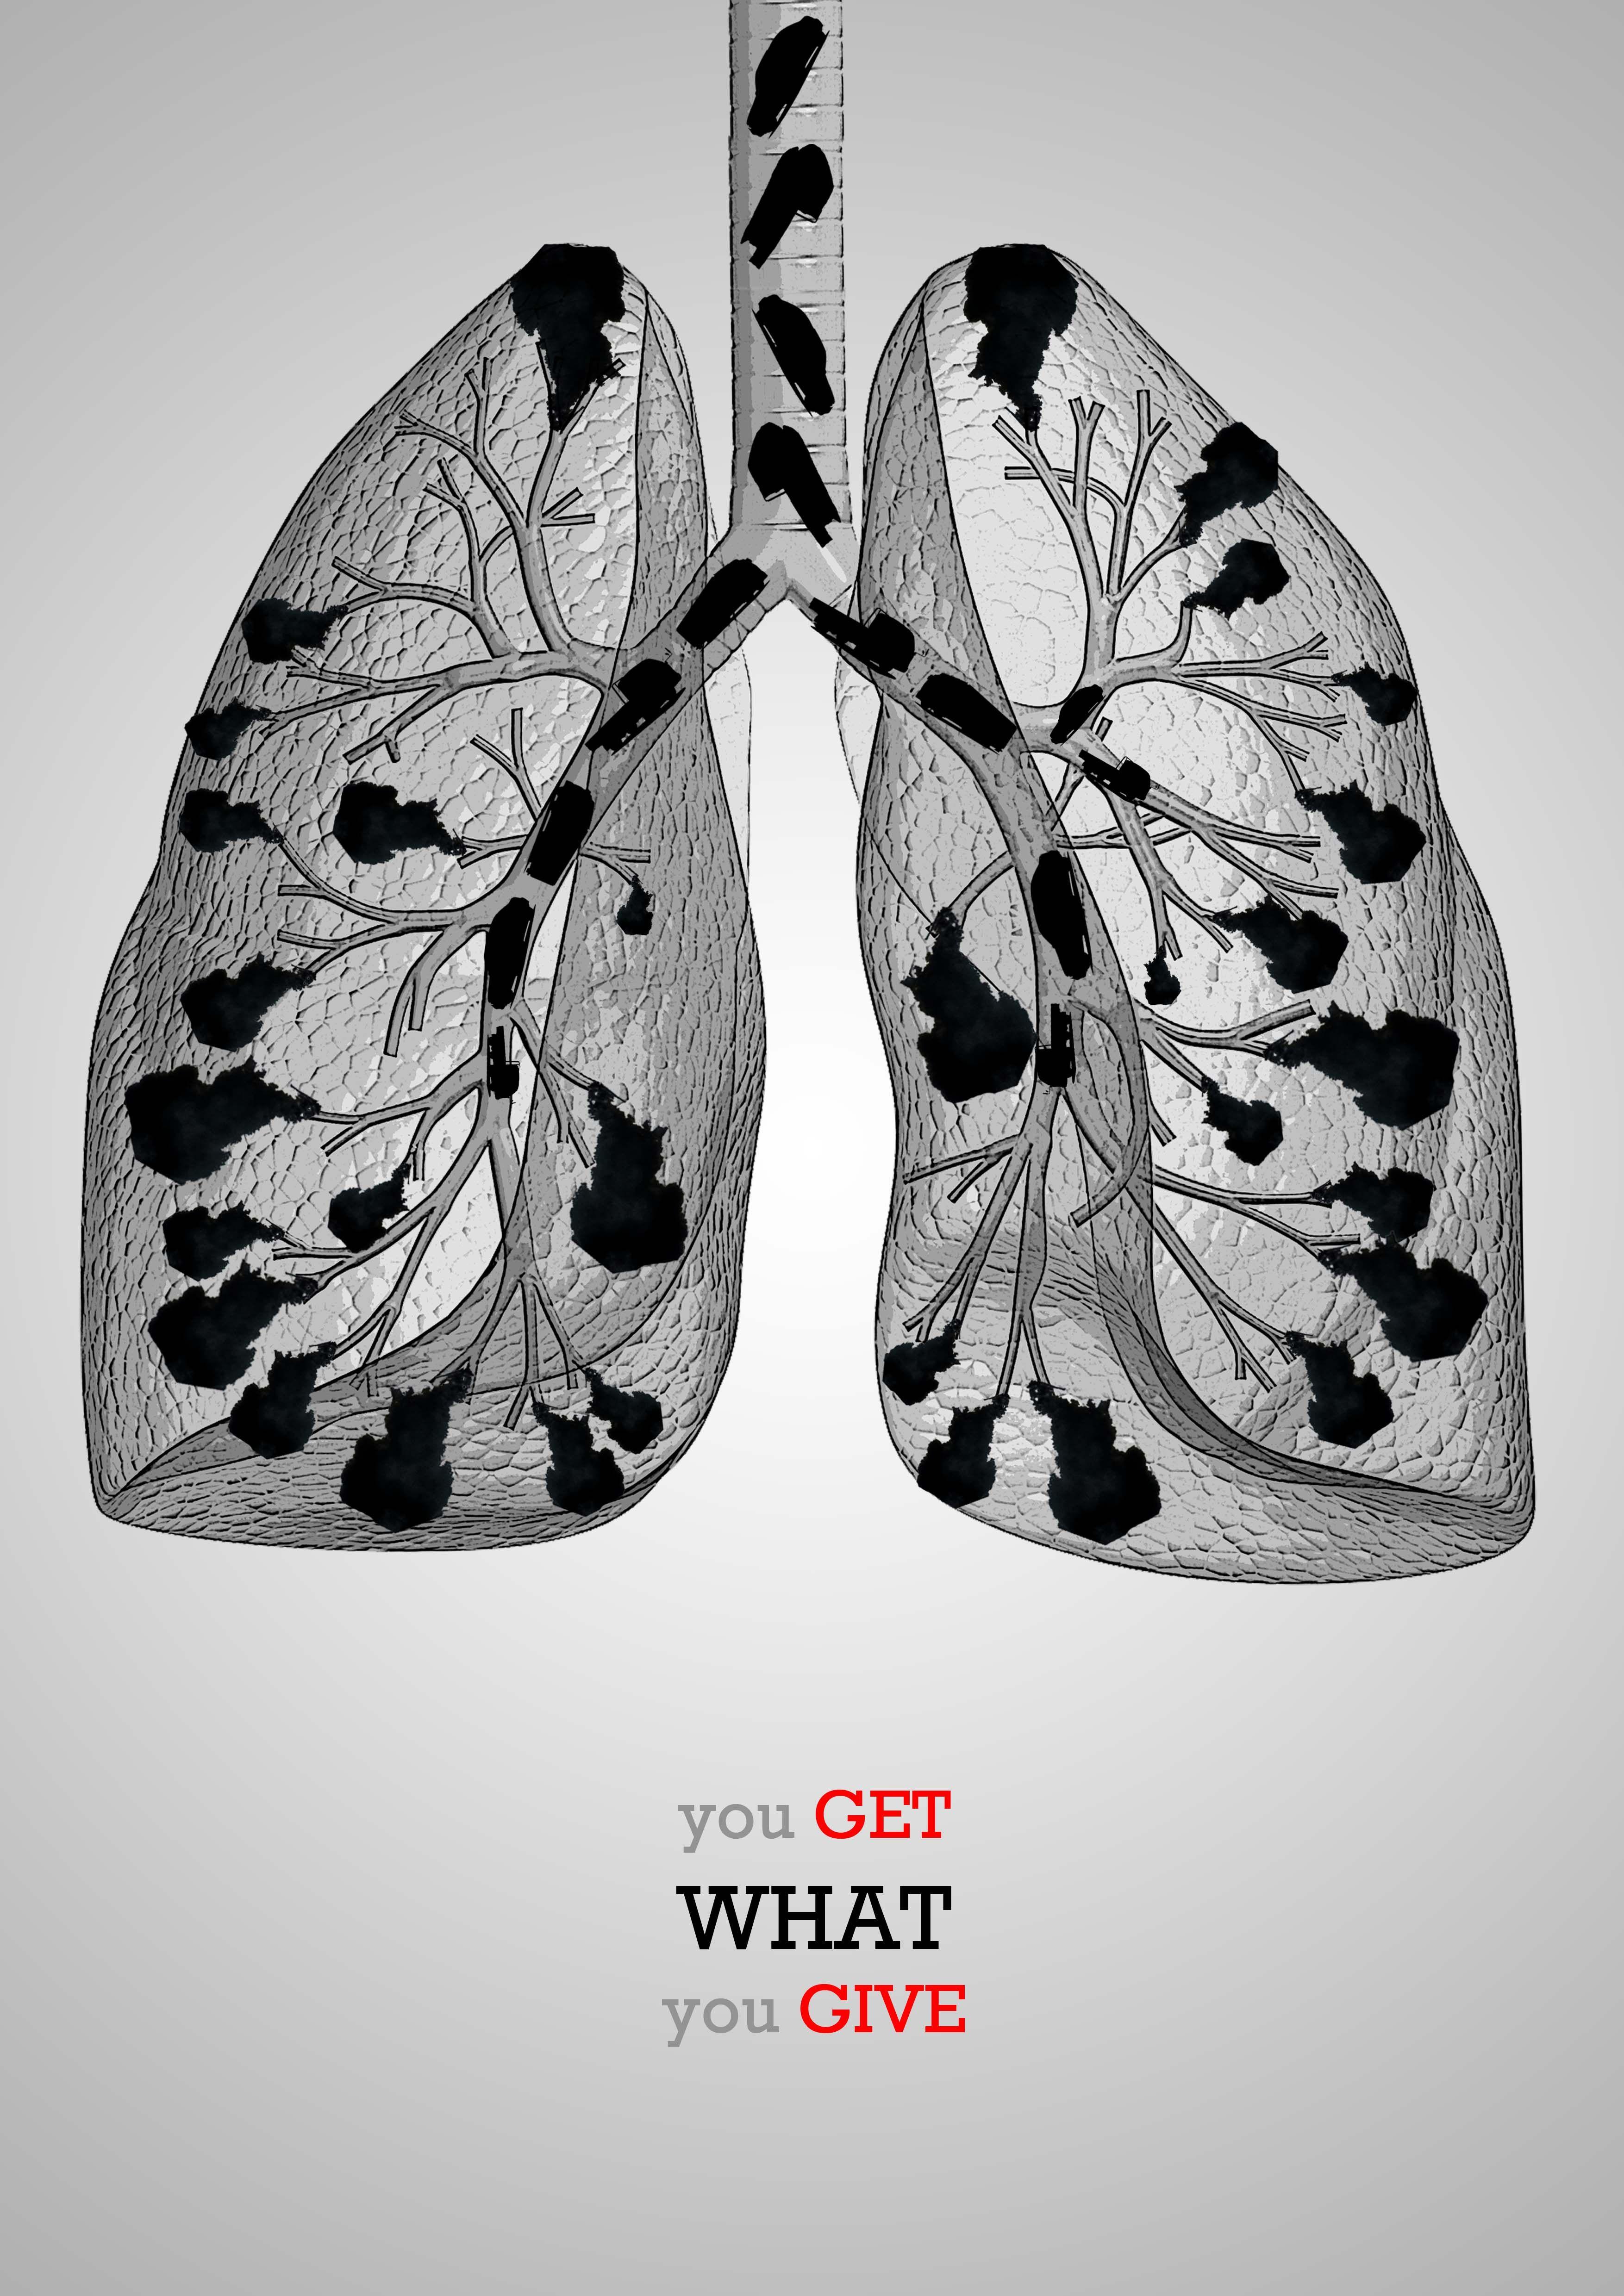 Air Pollution Skull : Motivational image air pollution by kaoru sho designs